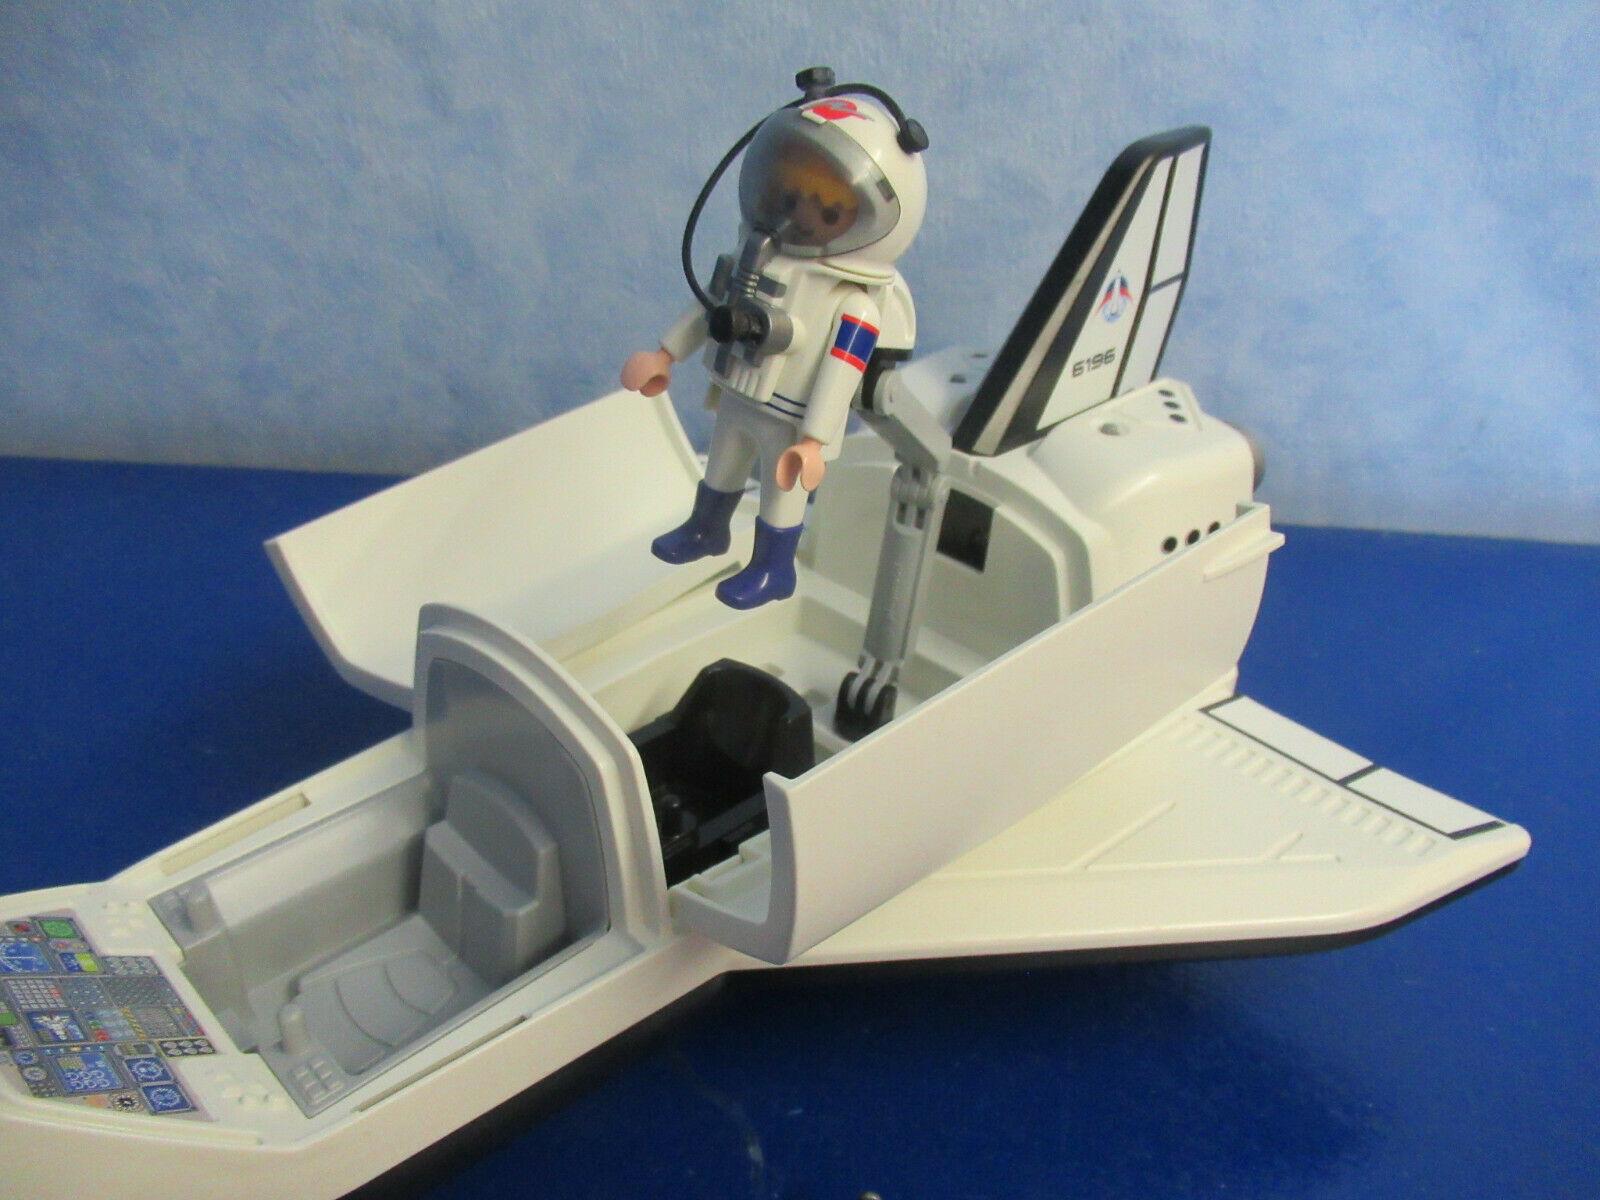 6196 Space Shuttle Figur Astronaut Zu 6195 Rakete Raumfahrt über Playmobil Raumfahrt